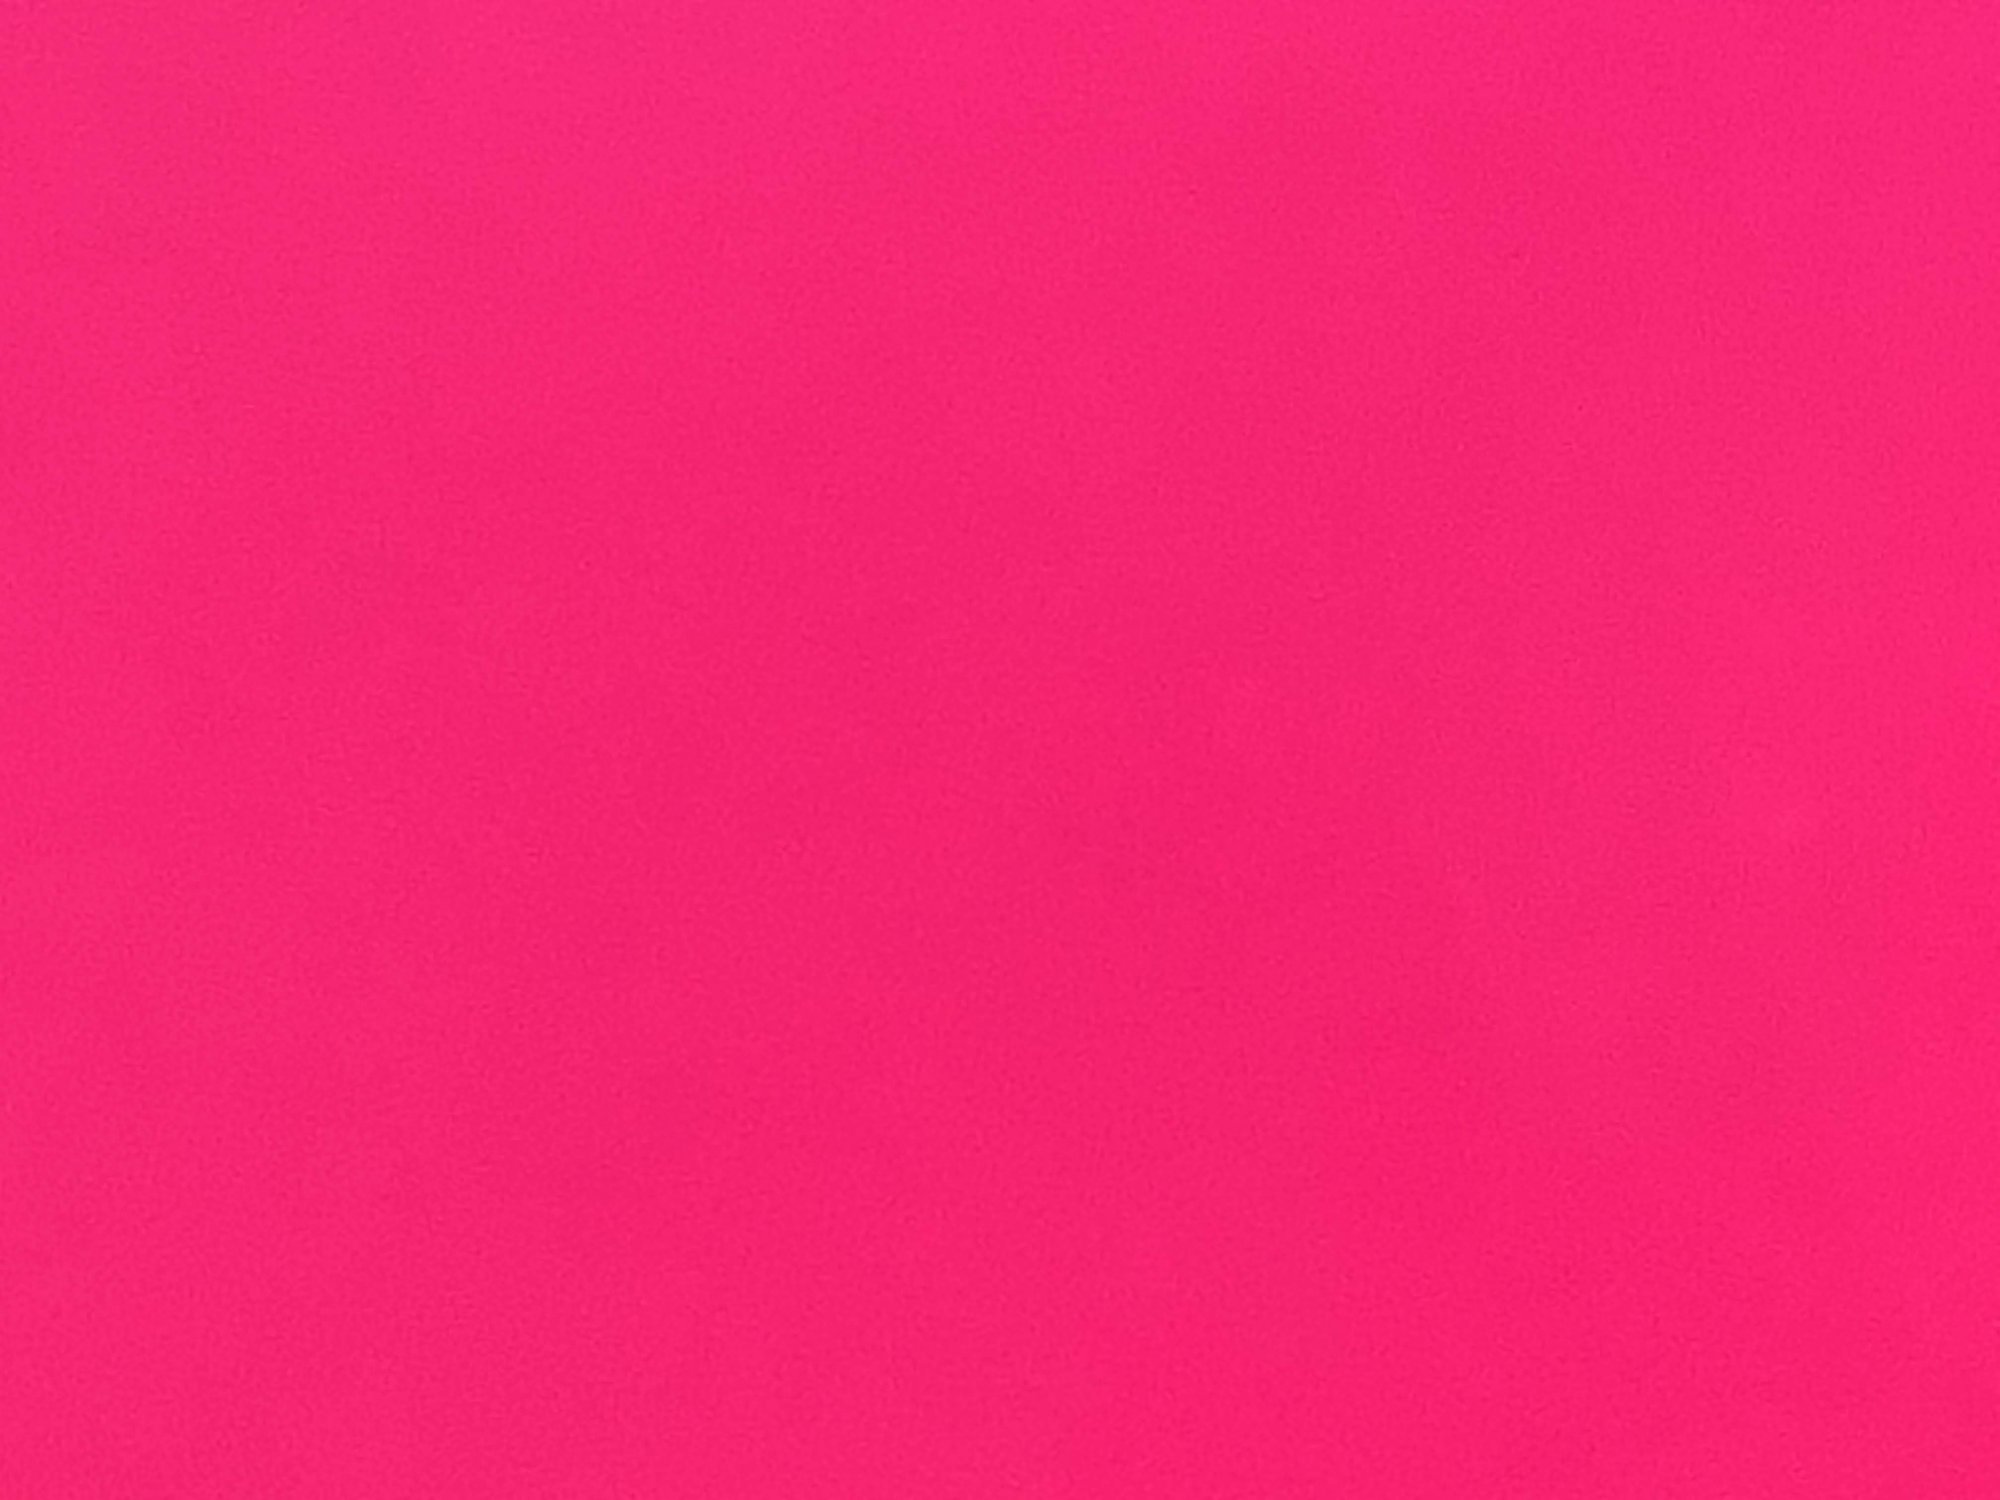 Stahls' Neon Pink Fashion-Film Heat Transfer Vinyl 12 x 15